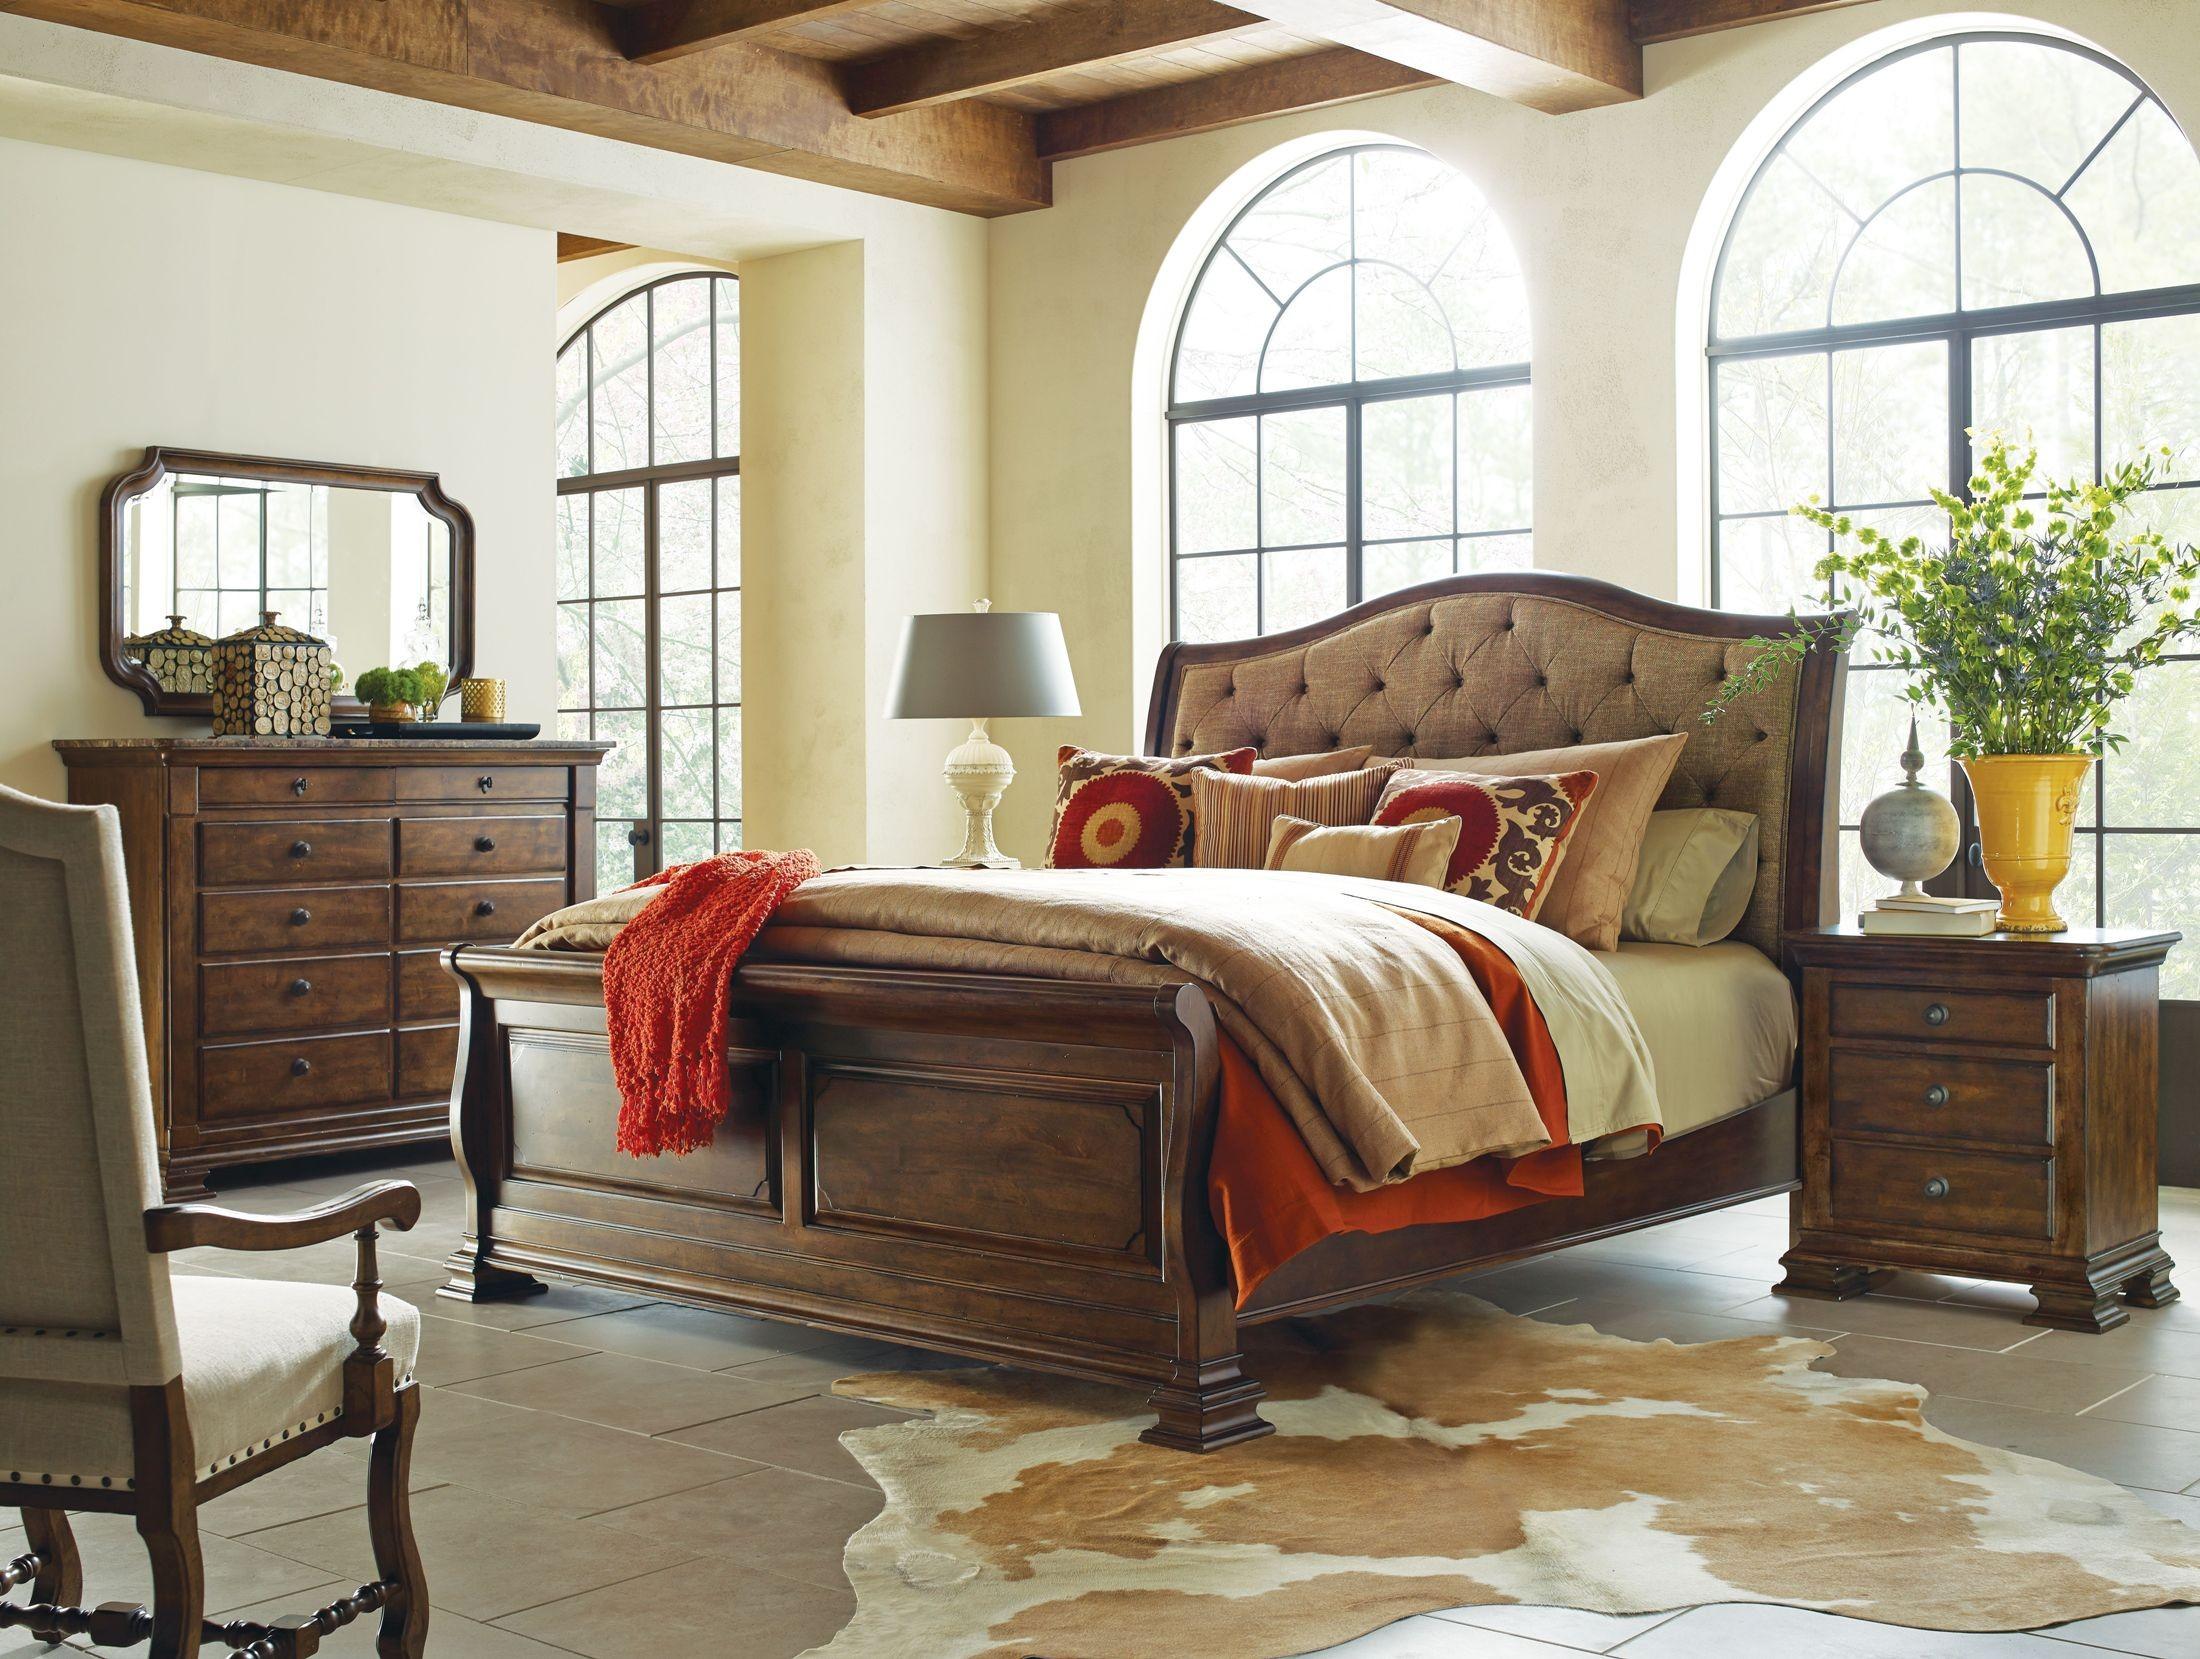 Beau Portolone Herringbone Sleigh Bedroom Set From Kincaid Furniture | Coleman  Furniture